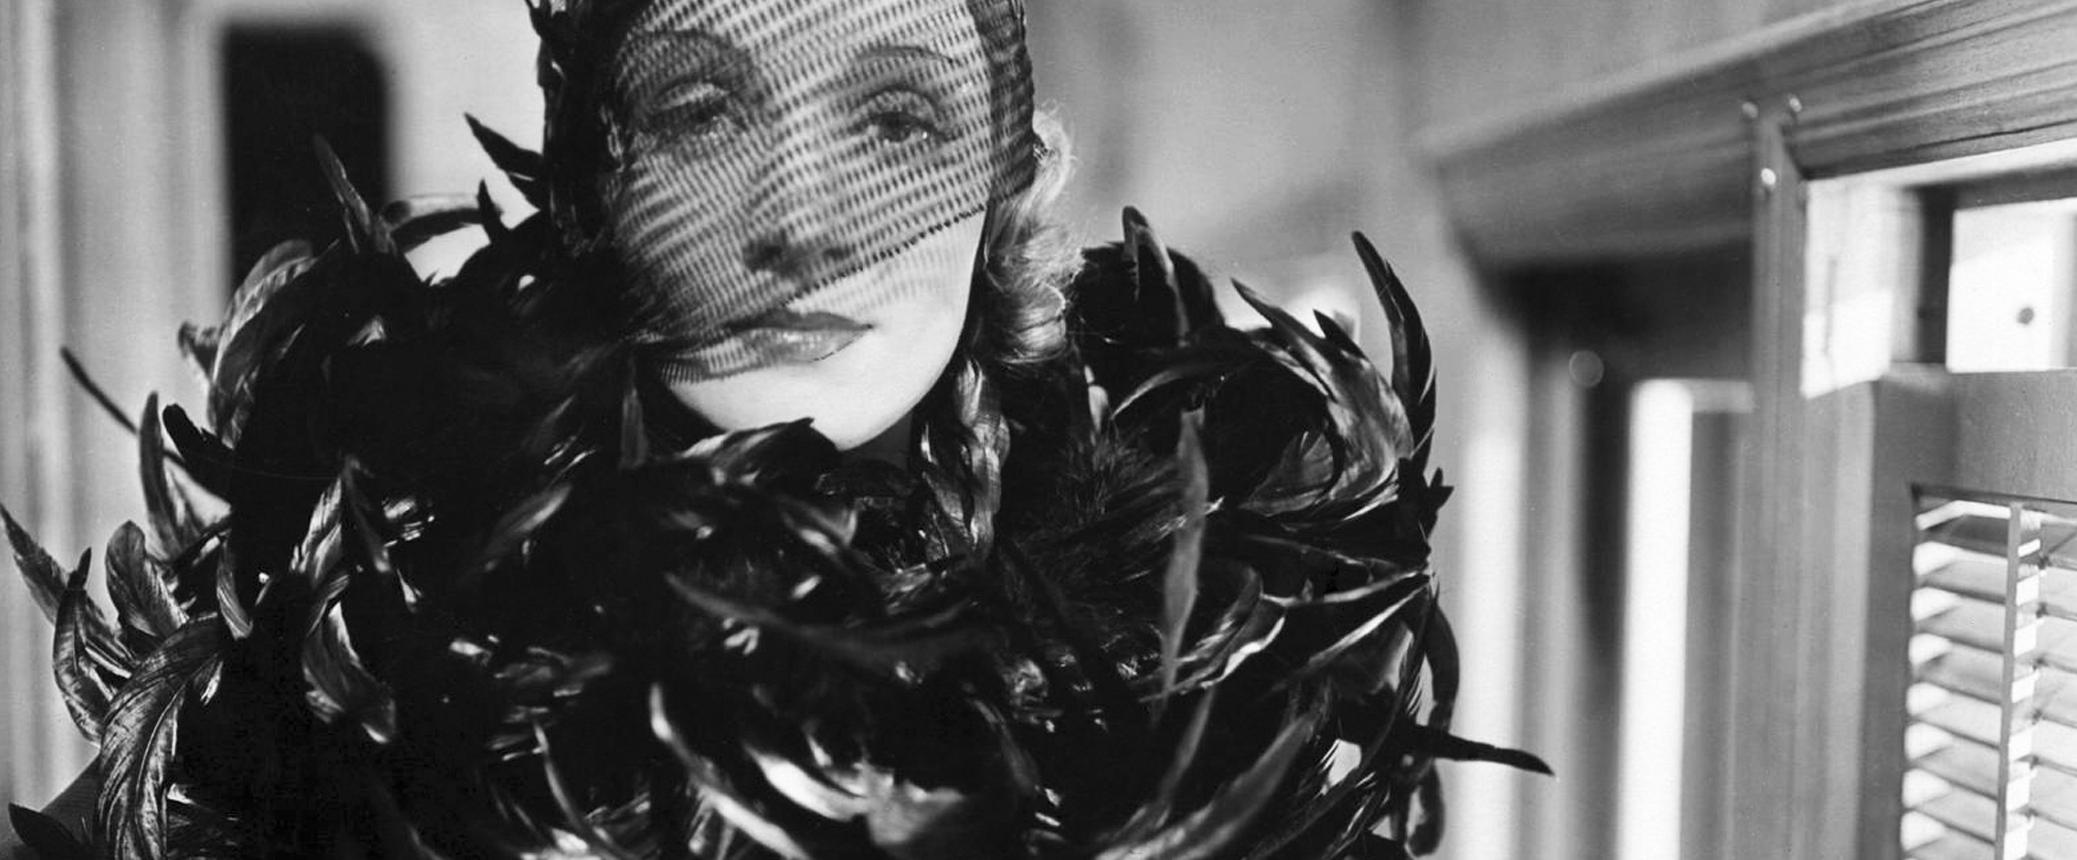 marlene dietrich dans Shanghaï Express (1932) de Josef von Sternberg